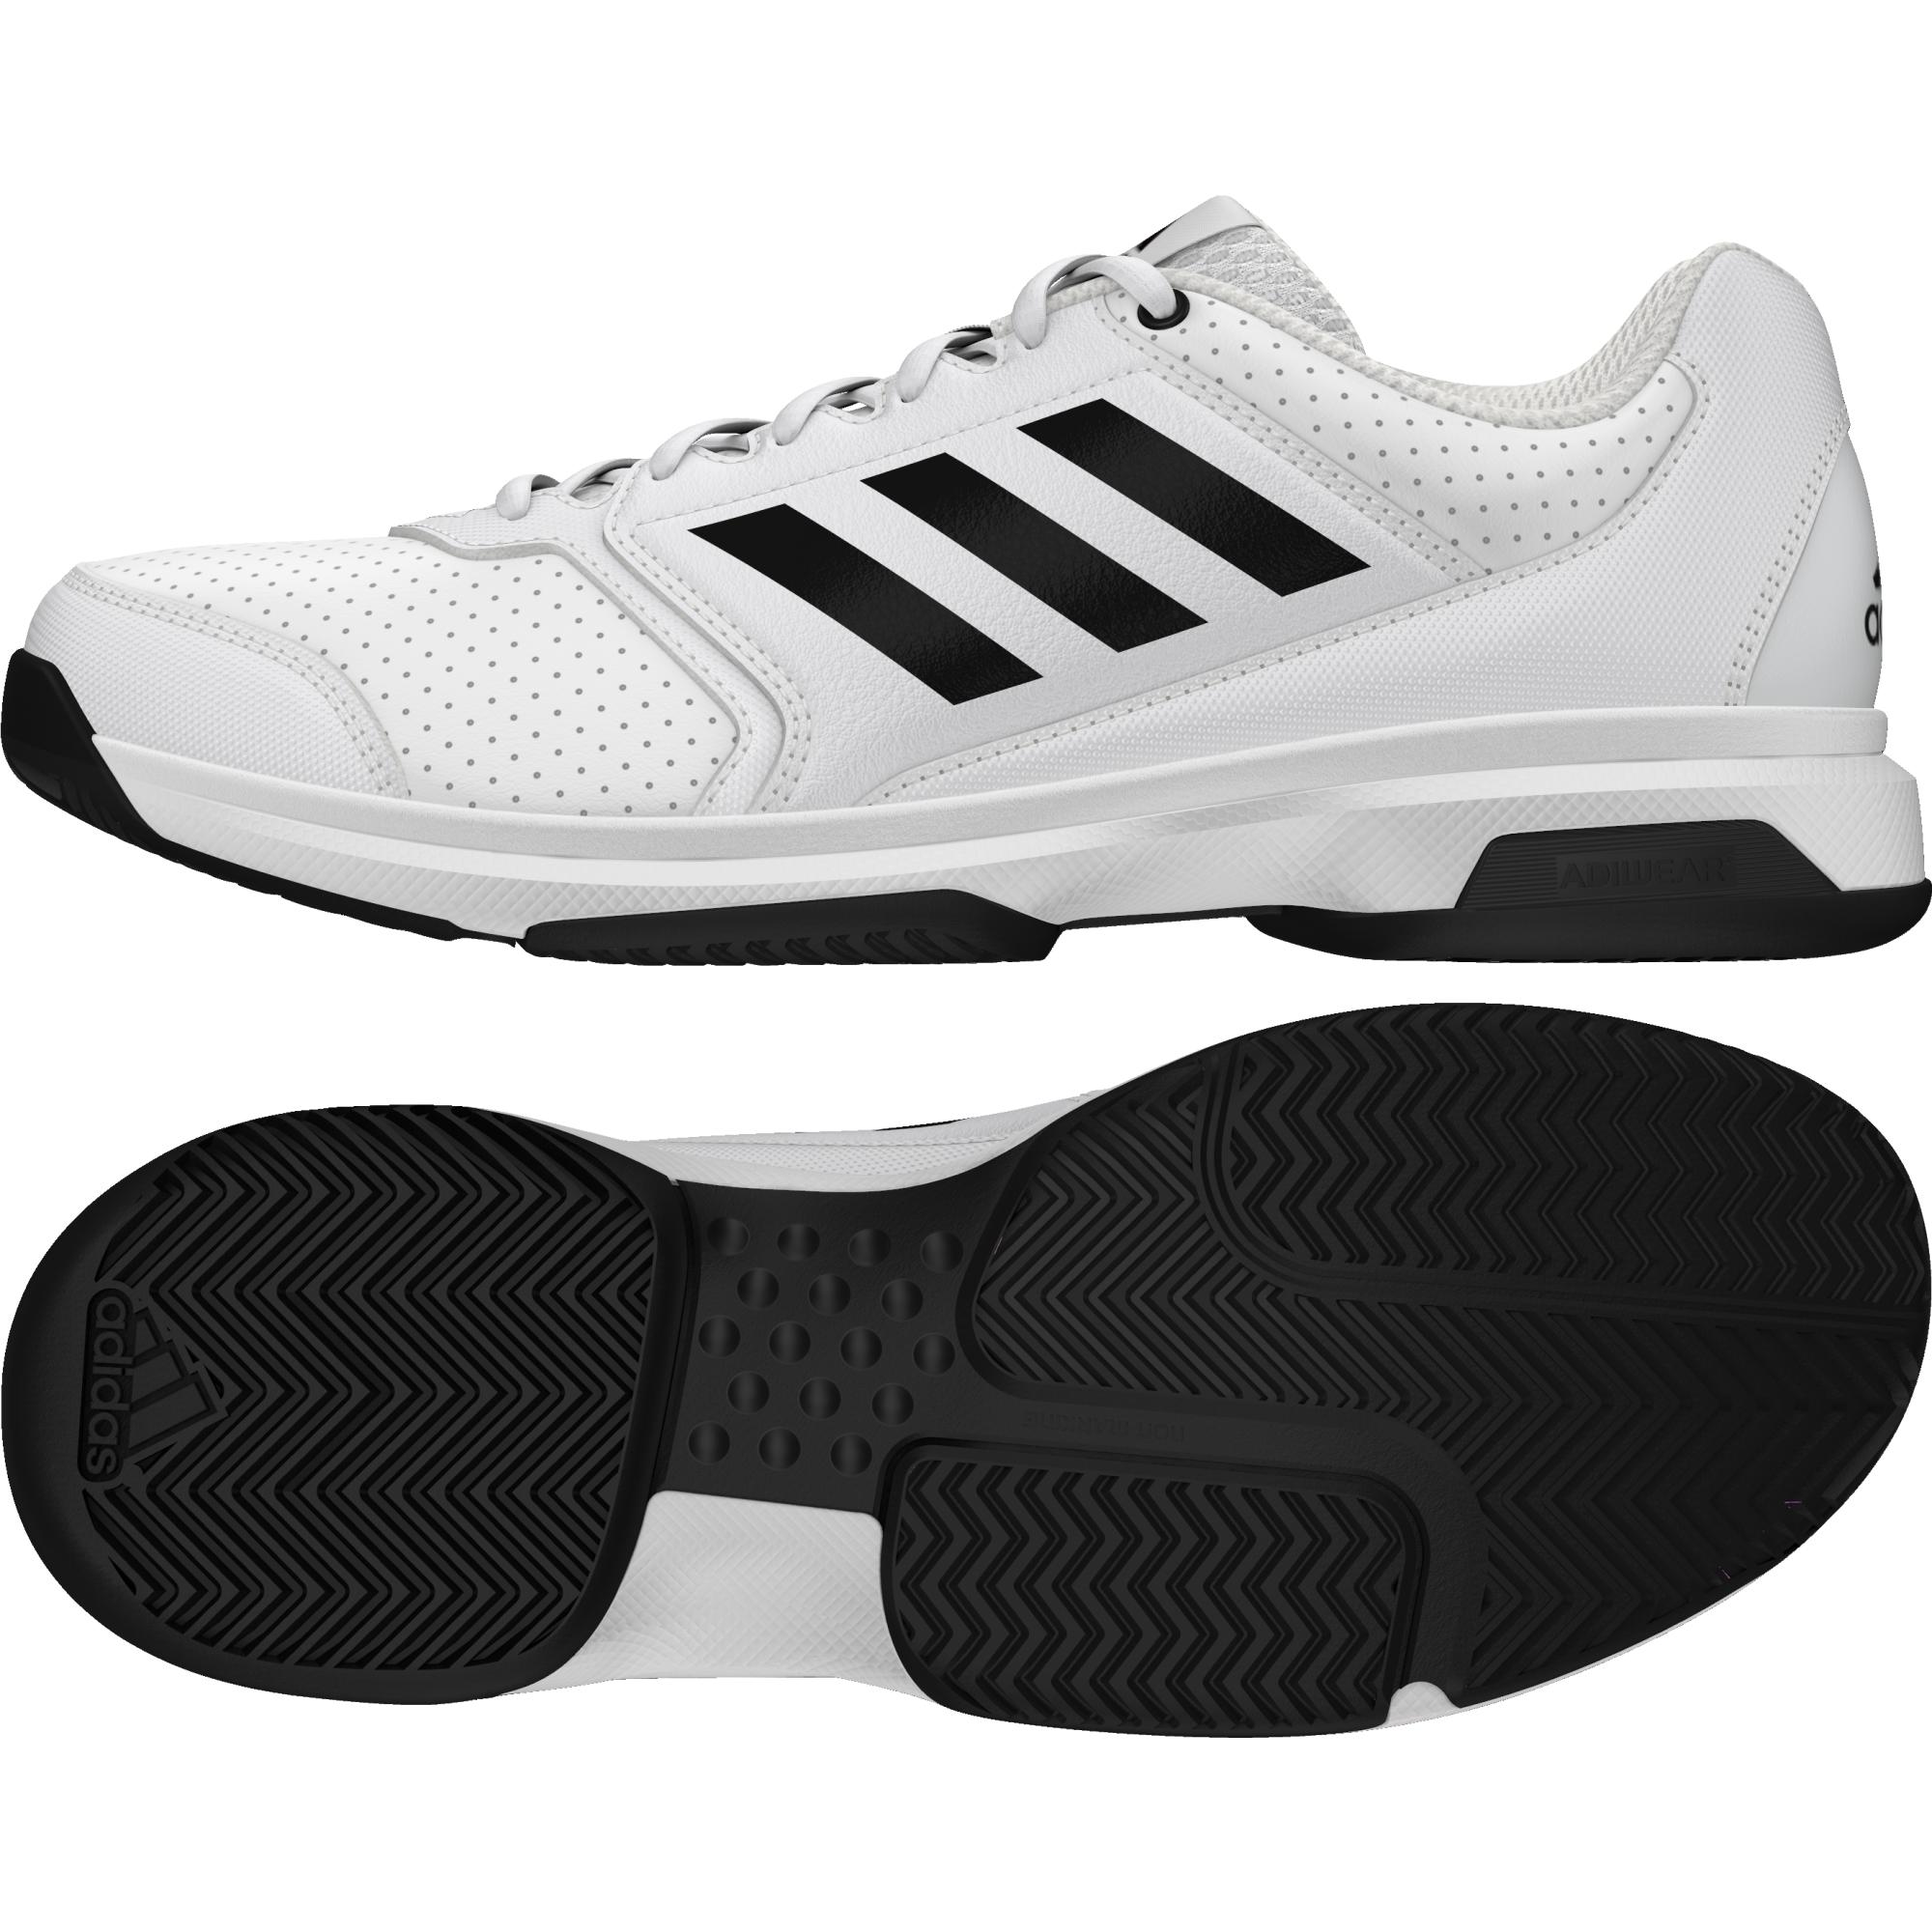 new concept 1af75 74318 Adidas Adizero Attack férfi teniszcipő , Férfi cipő  teniszcipő   adidasperformance  Adidas Adizero Attack férfi teniszcipő